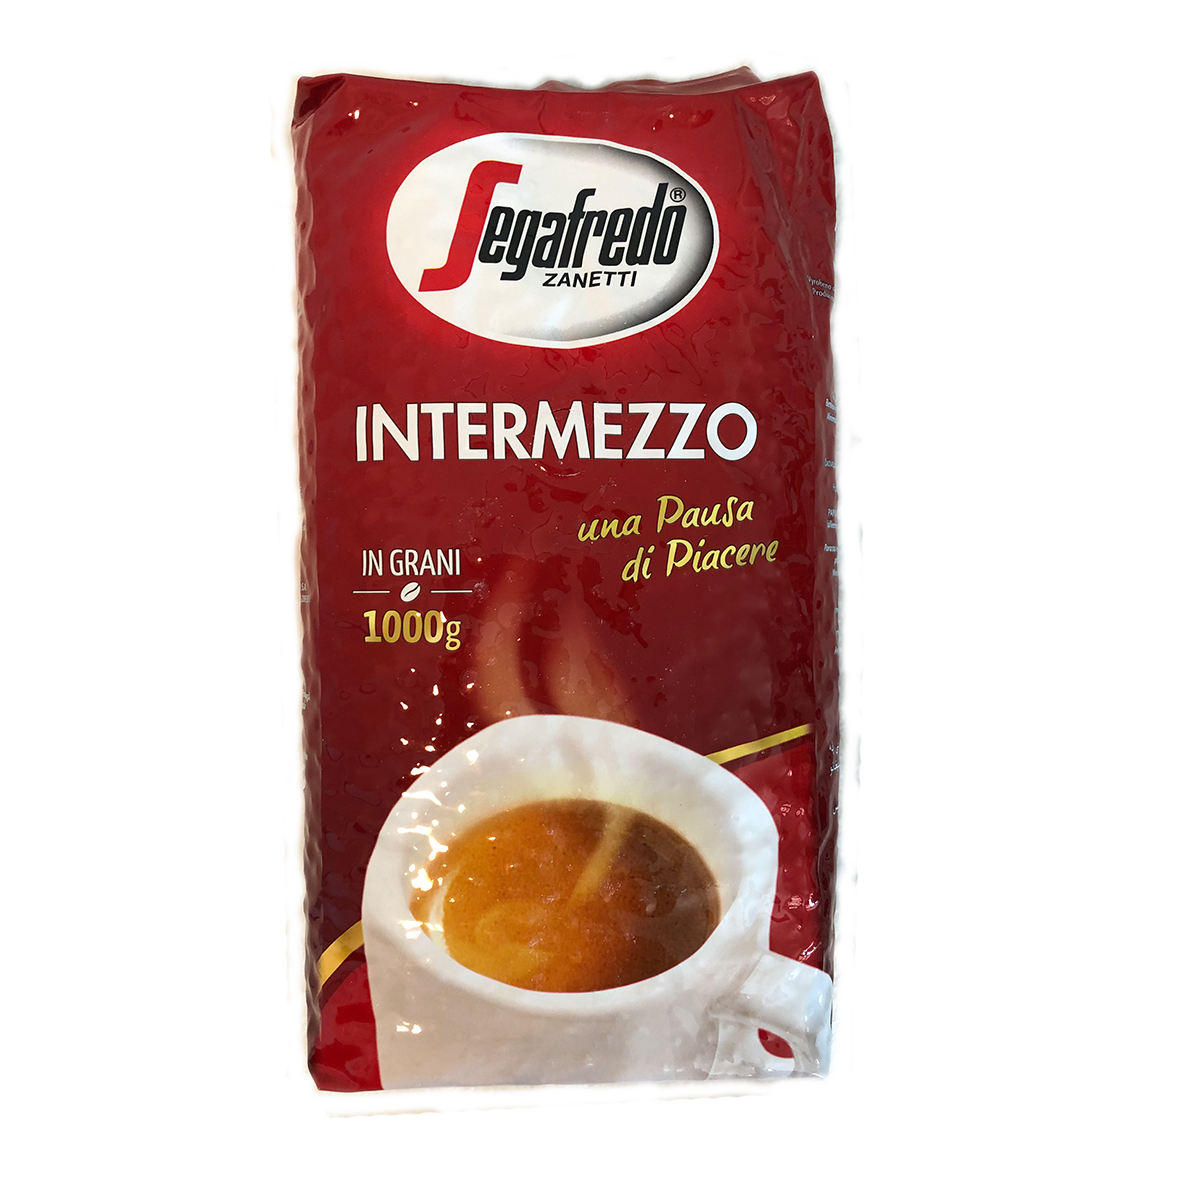 Segafredo Intermezzo Italia 1000 g